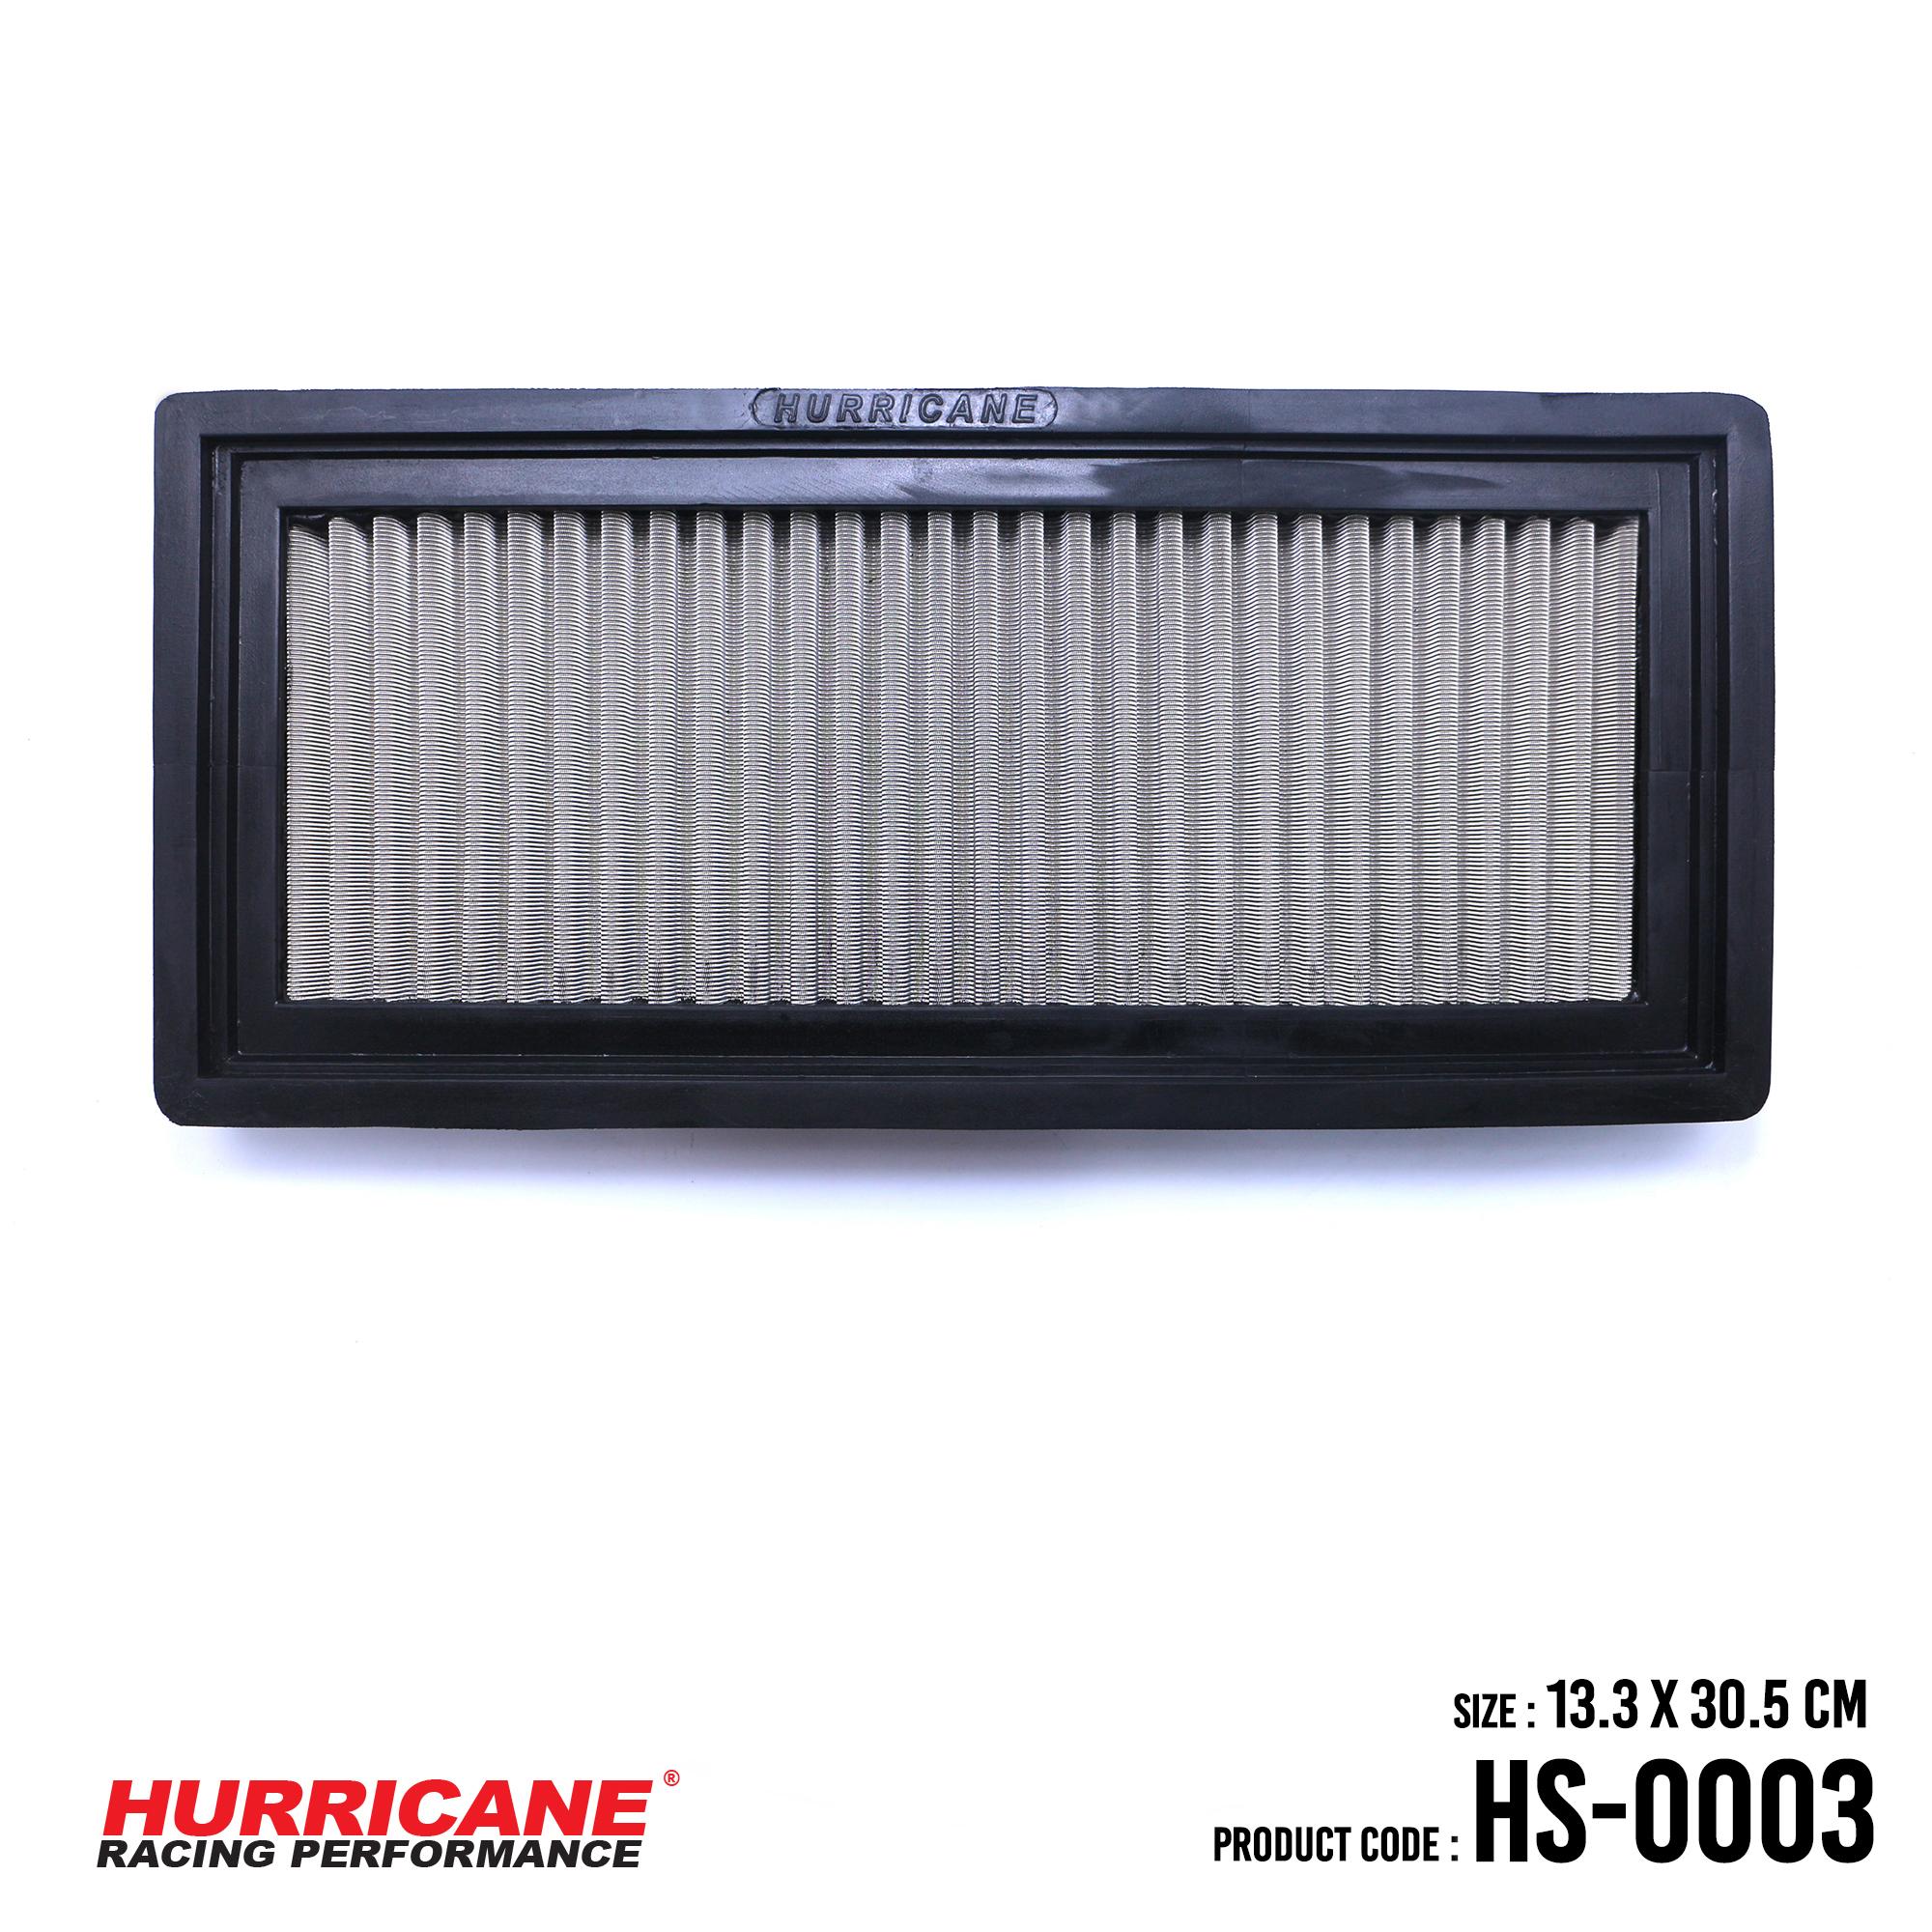 HURRICANE STAINLESS STEEL AIR FILTER FOR HS-0003 Alfa